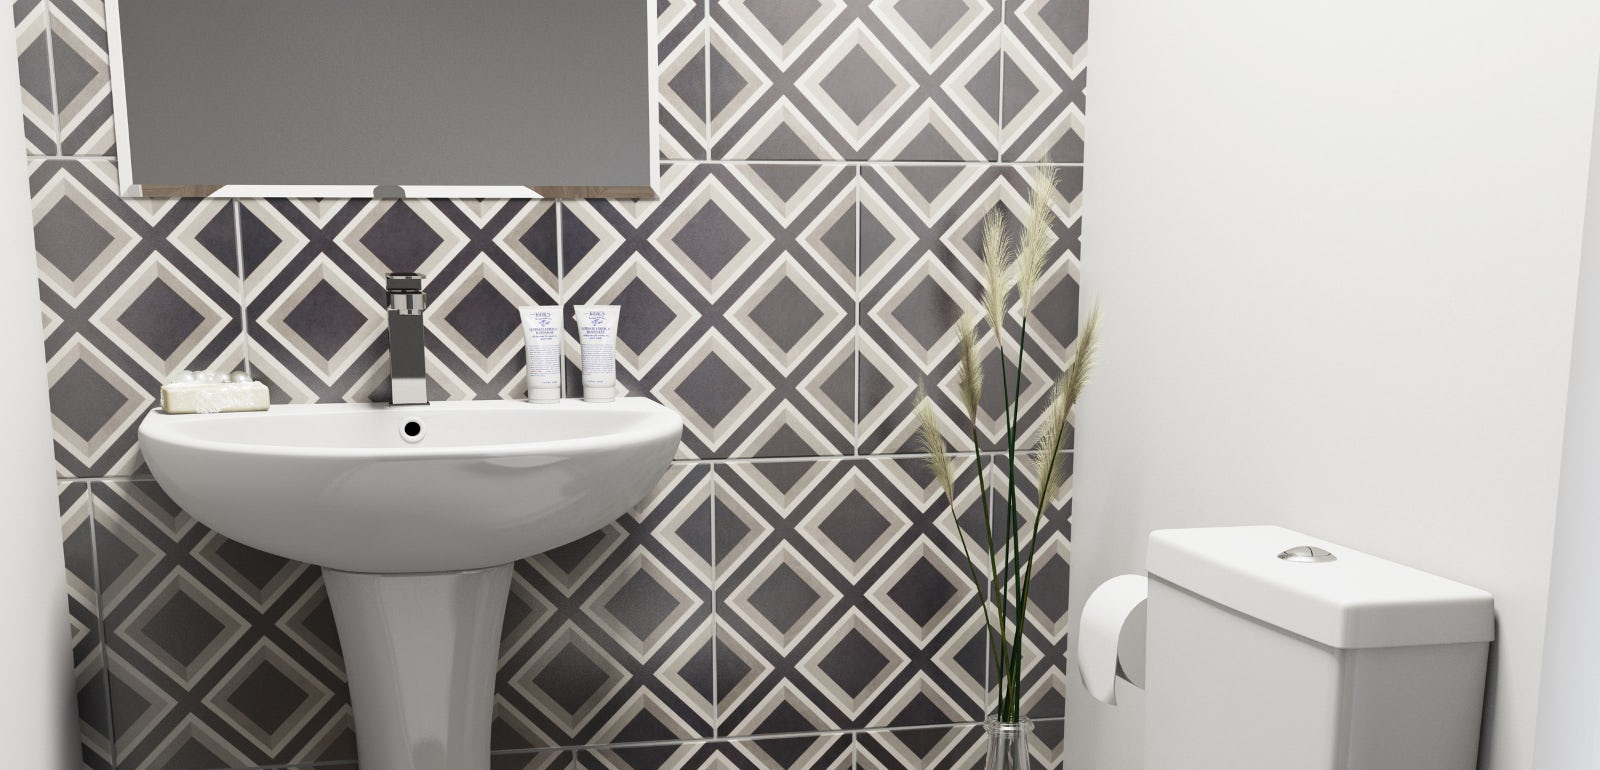 Small cloakroom bathroom ideas | VictoriaPlum.com